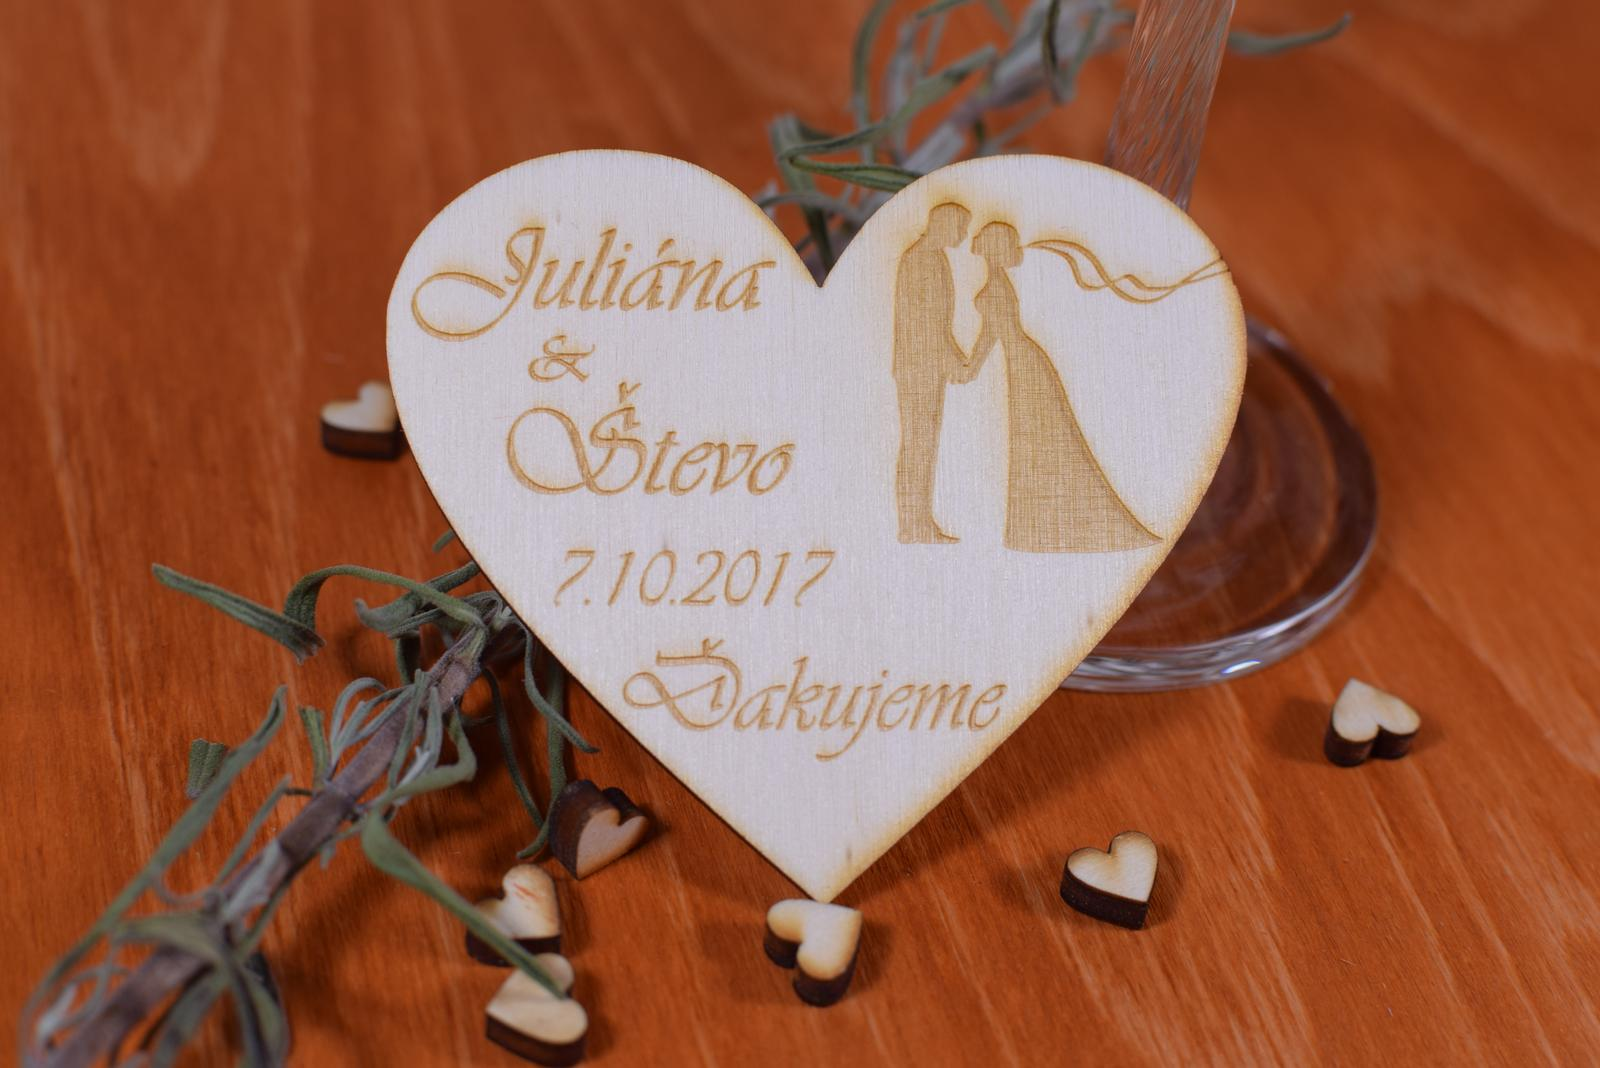 Fotogaleria darekov - svadobn dareky pre host - eshop